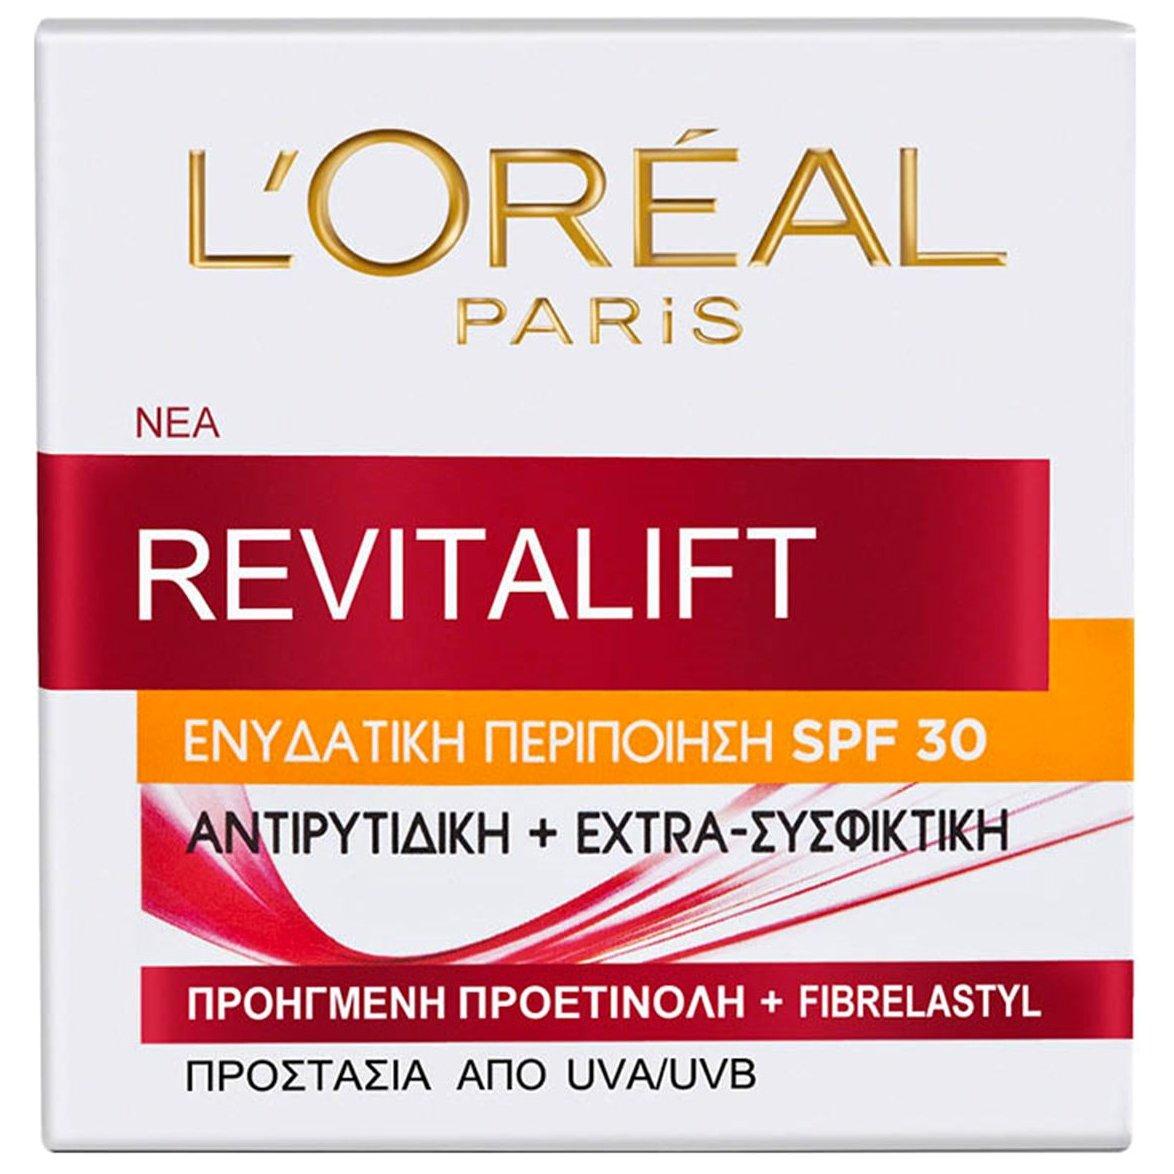 L'oreal Paris Revitalift Spf30 Αντιρυτιδική Κρέμα Ημέρας 50ml